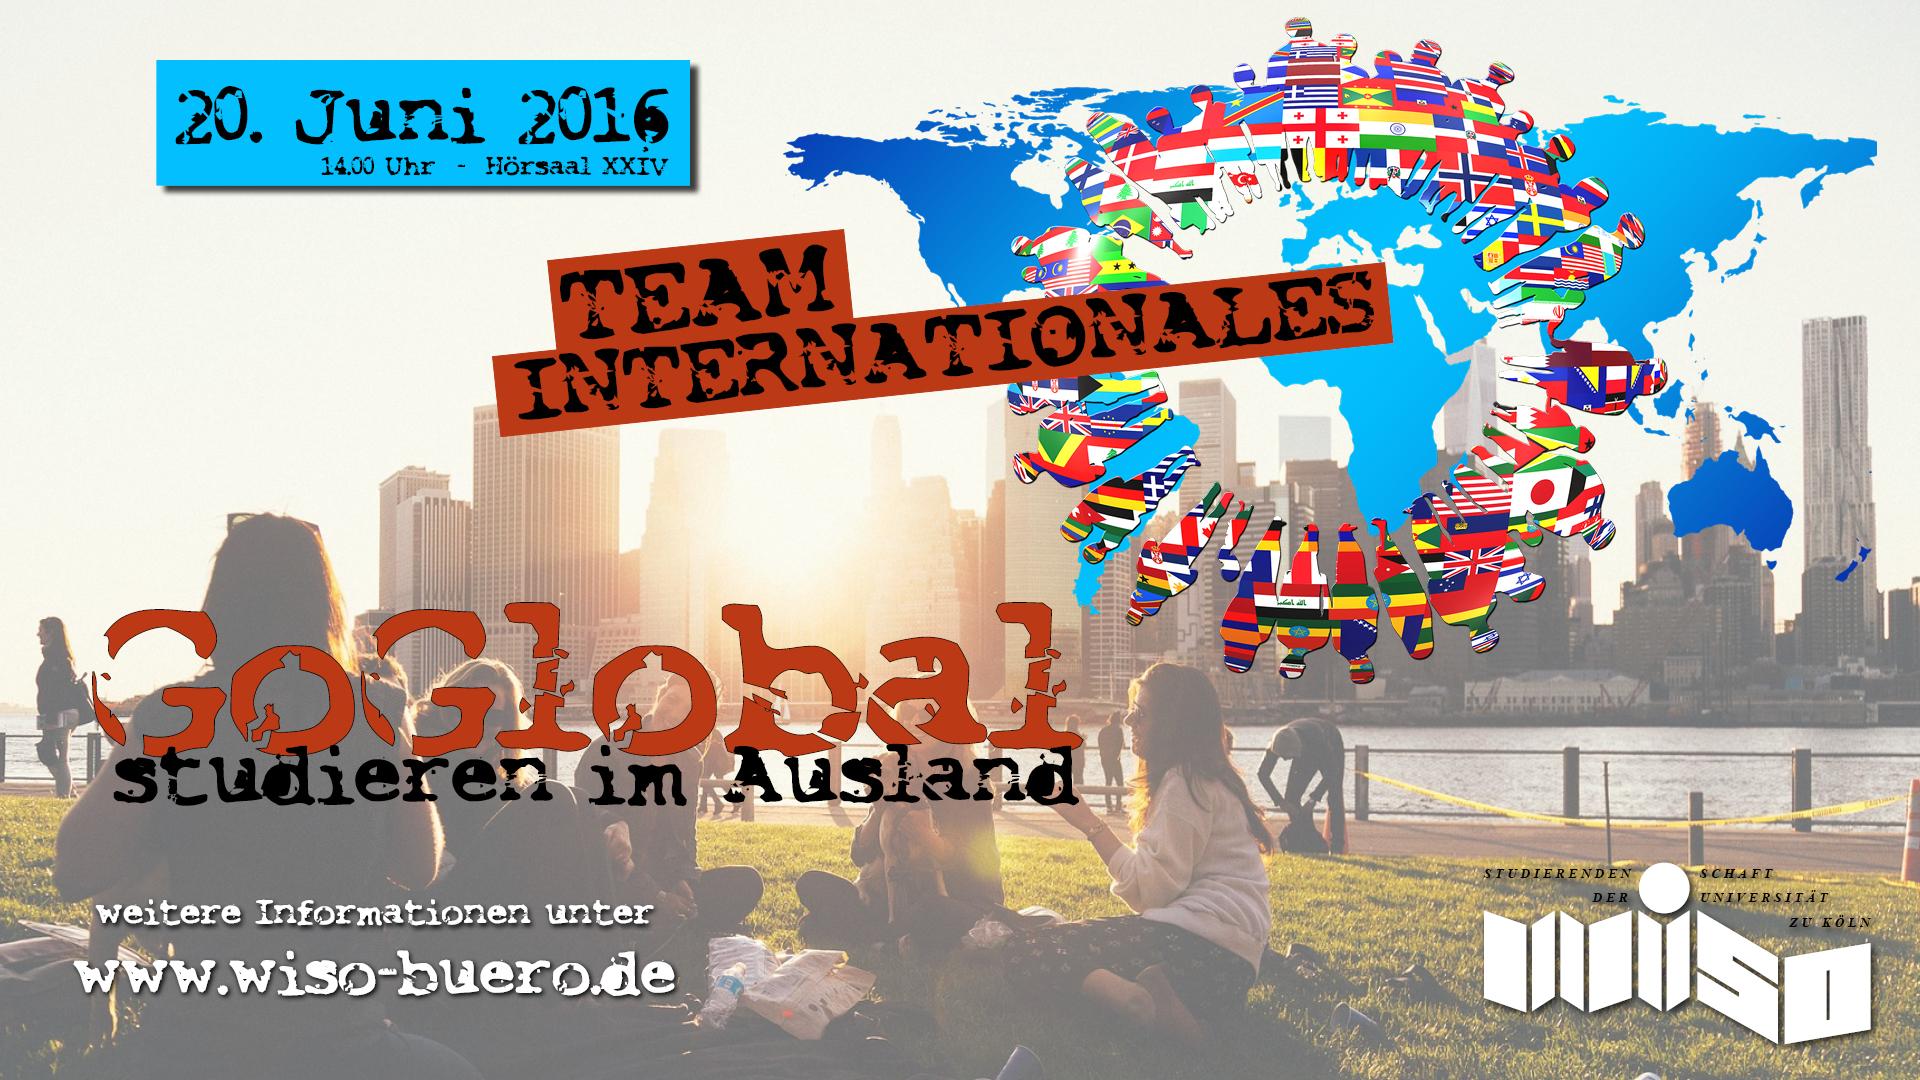 Goglobal studieren im ausland wiso buero for Studieren im ausland